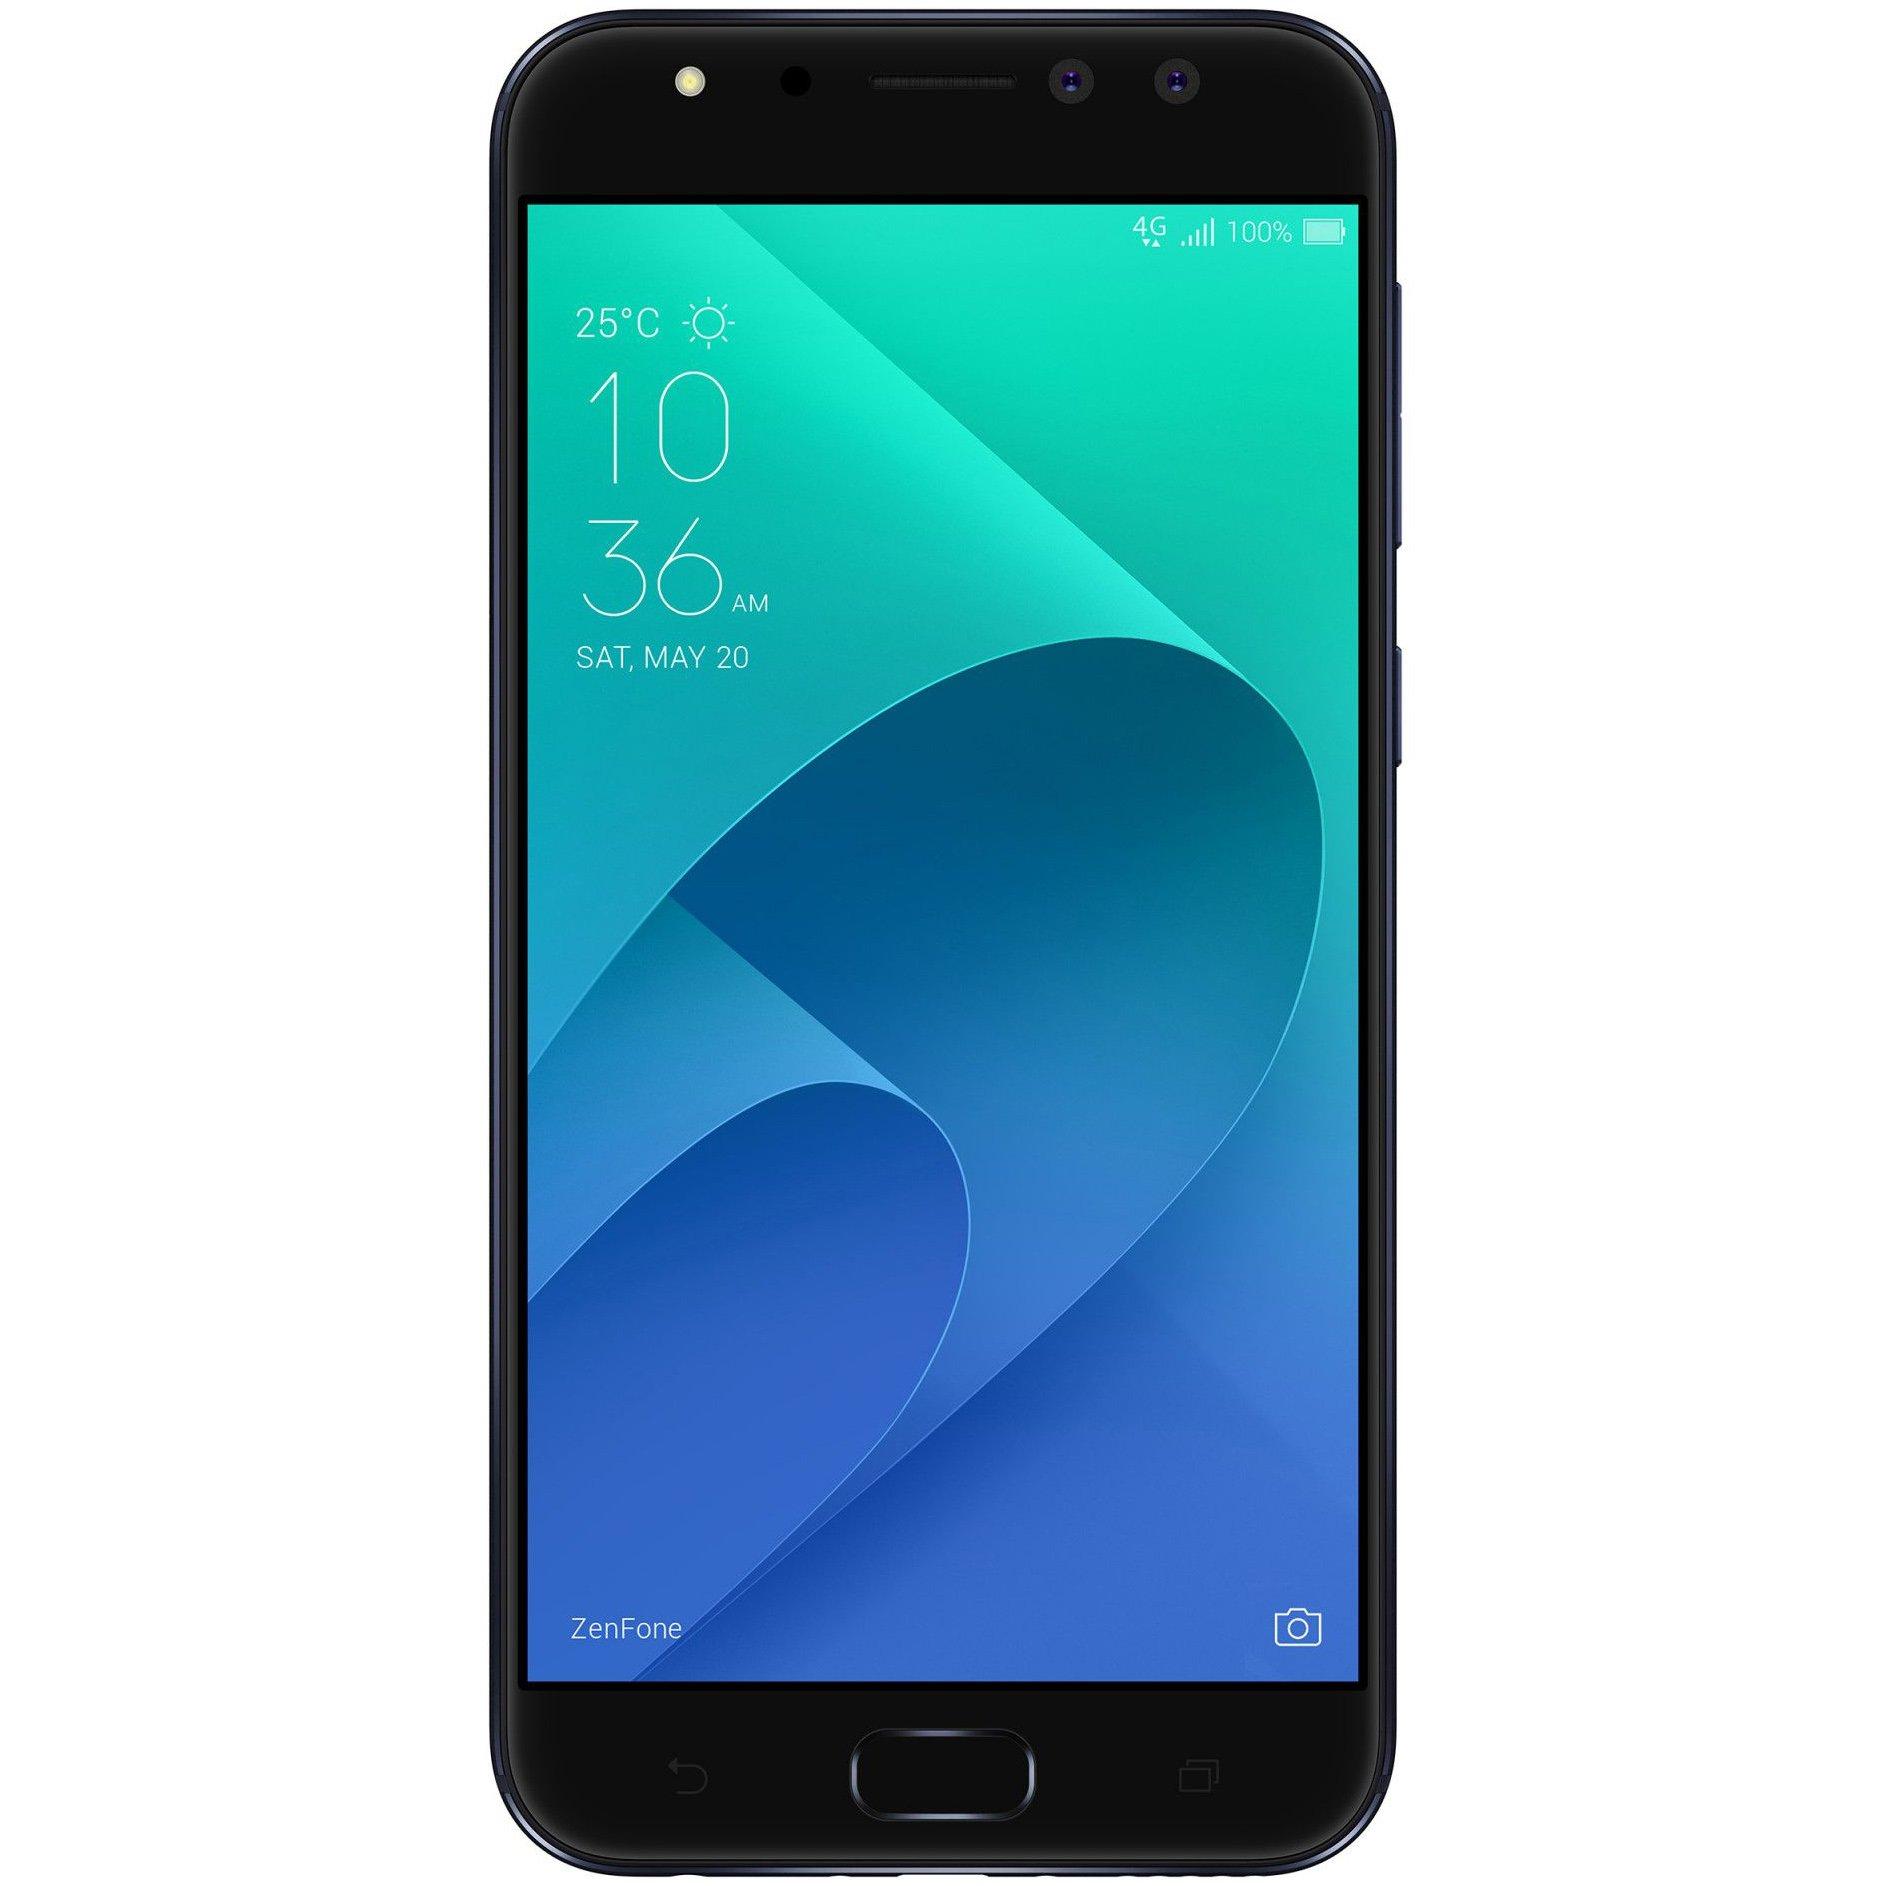 Telefon mobil Asus Zenfone 4 Selfie Pro, ZD552KL, Dual SIM, 64GB, 4GB RAM, 4G, Deepsea Black